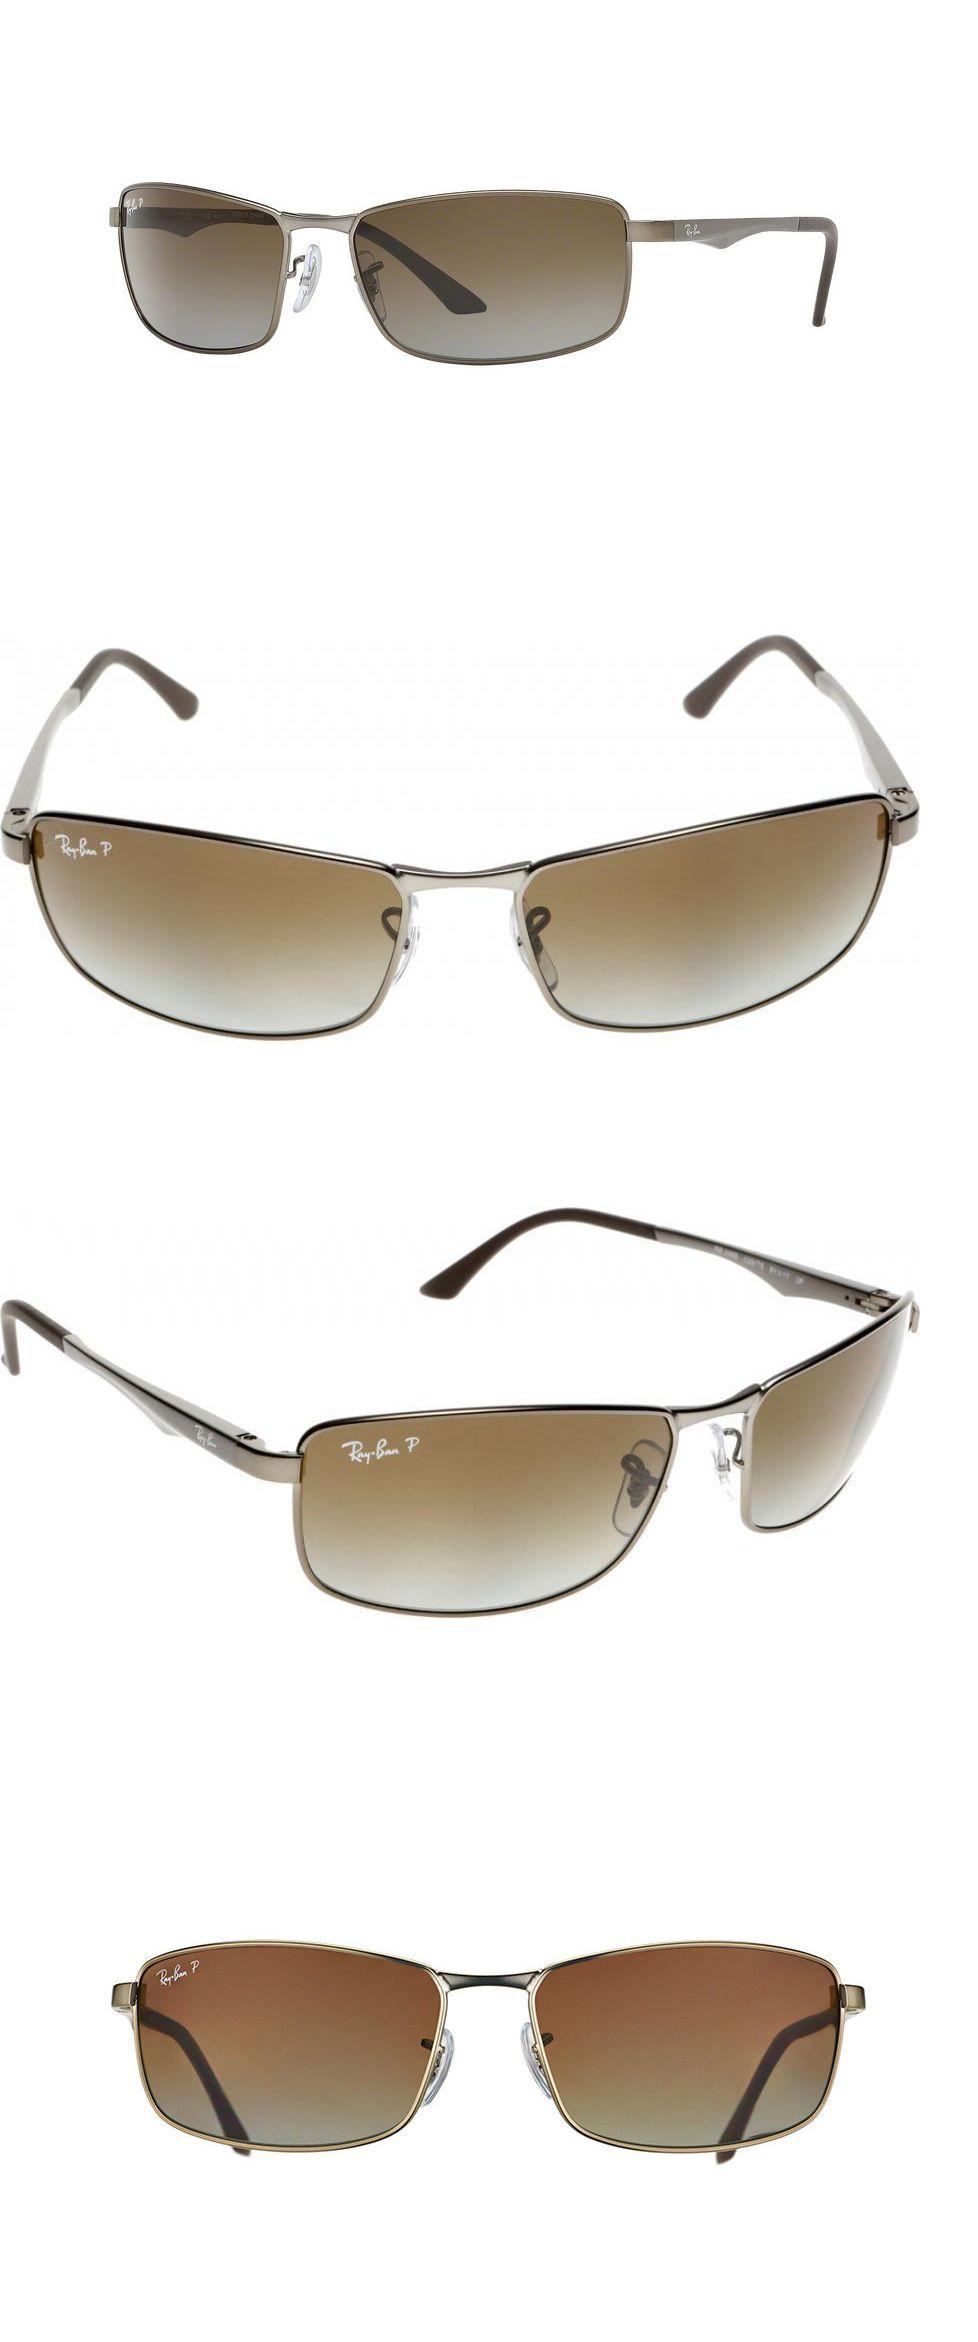 78920f5090 Sunglasses 155189  Ray-Ban Rb3498 029 T5 Gunmetal Frame Polarized Brown  61Mm Lens Sunglasses